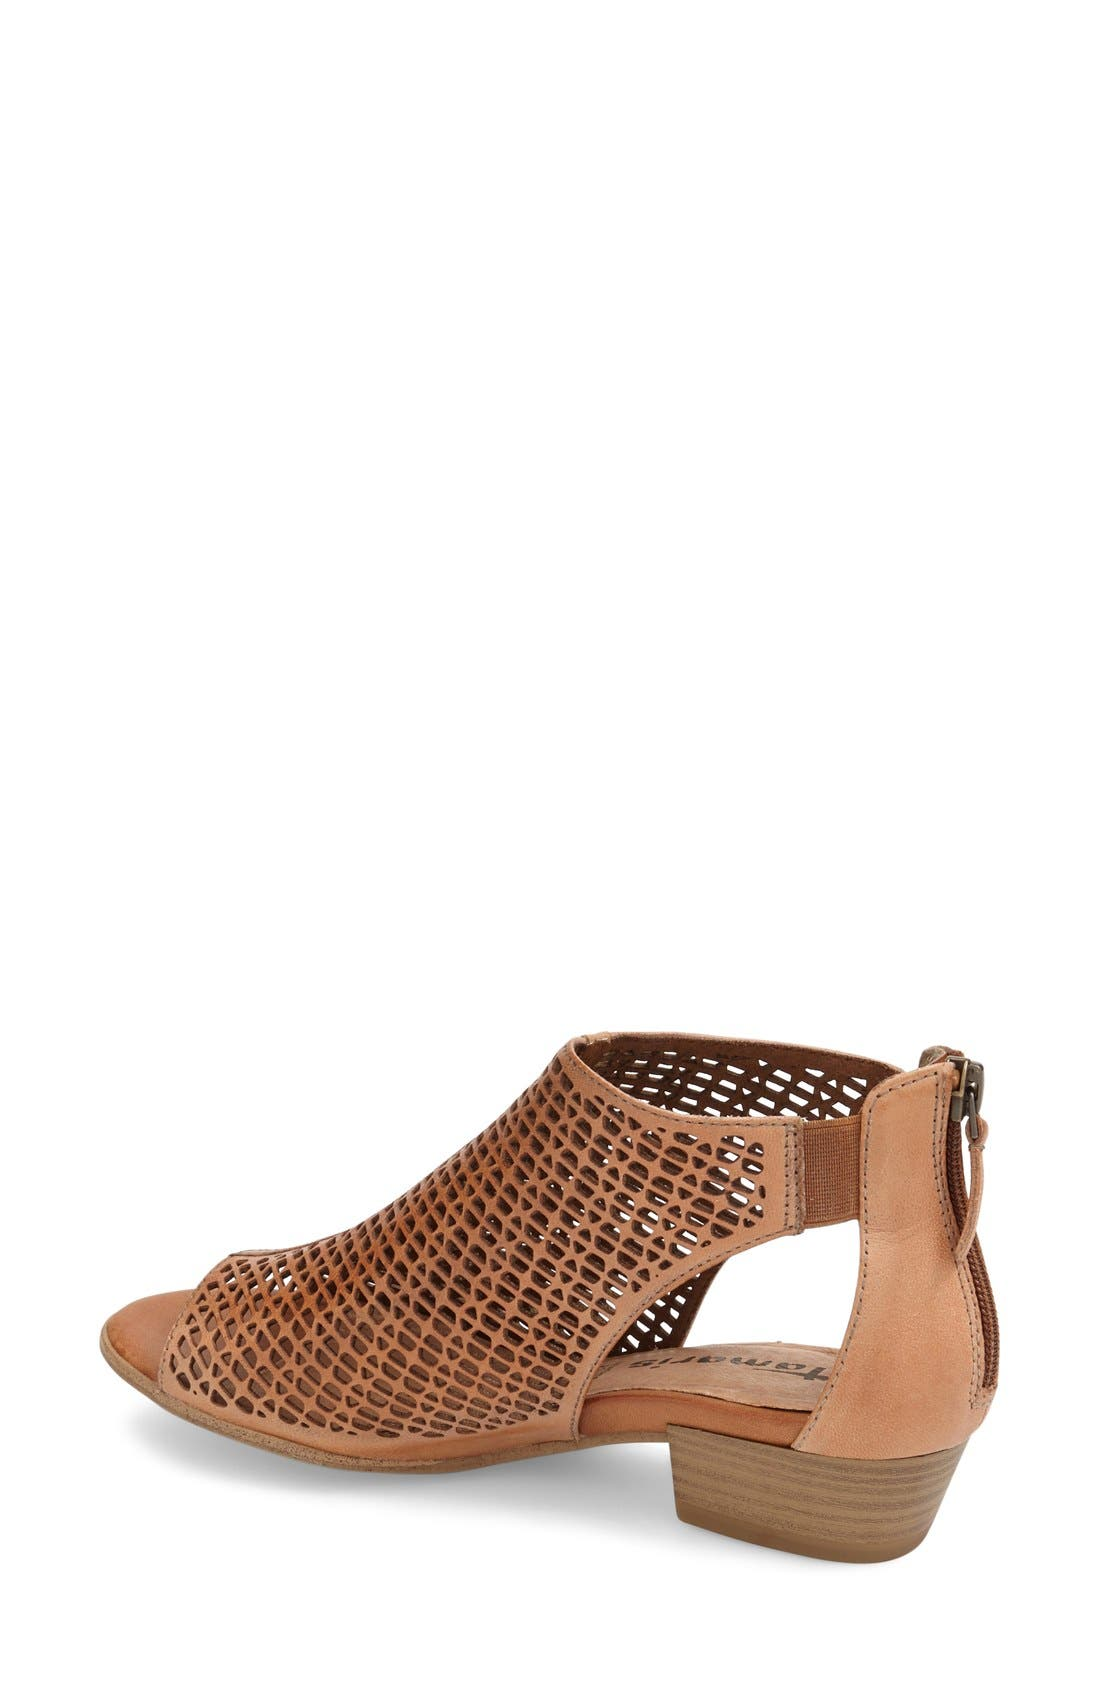 Alternate Image 2  - Tamaris 'Nao' Open Toe Sandal (Women)